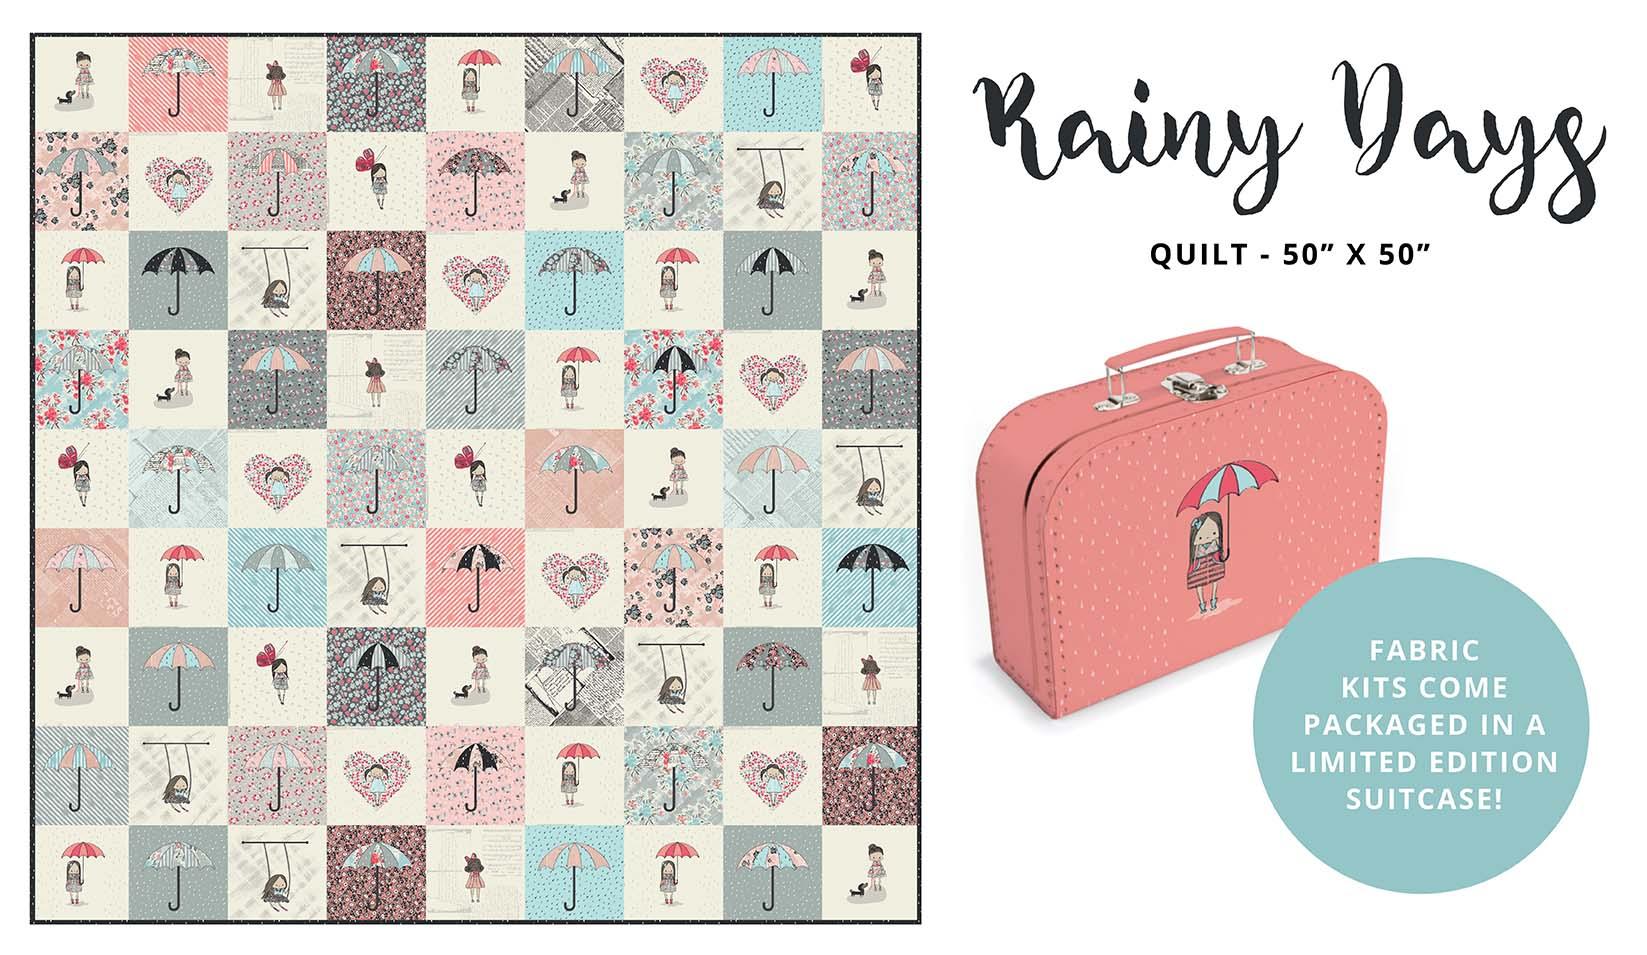 Sue Daley Designs - Rainy Days Suitcase Kit